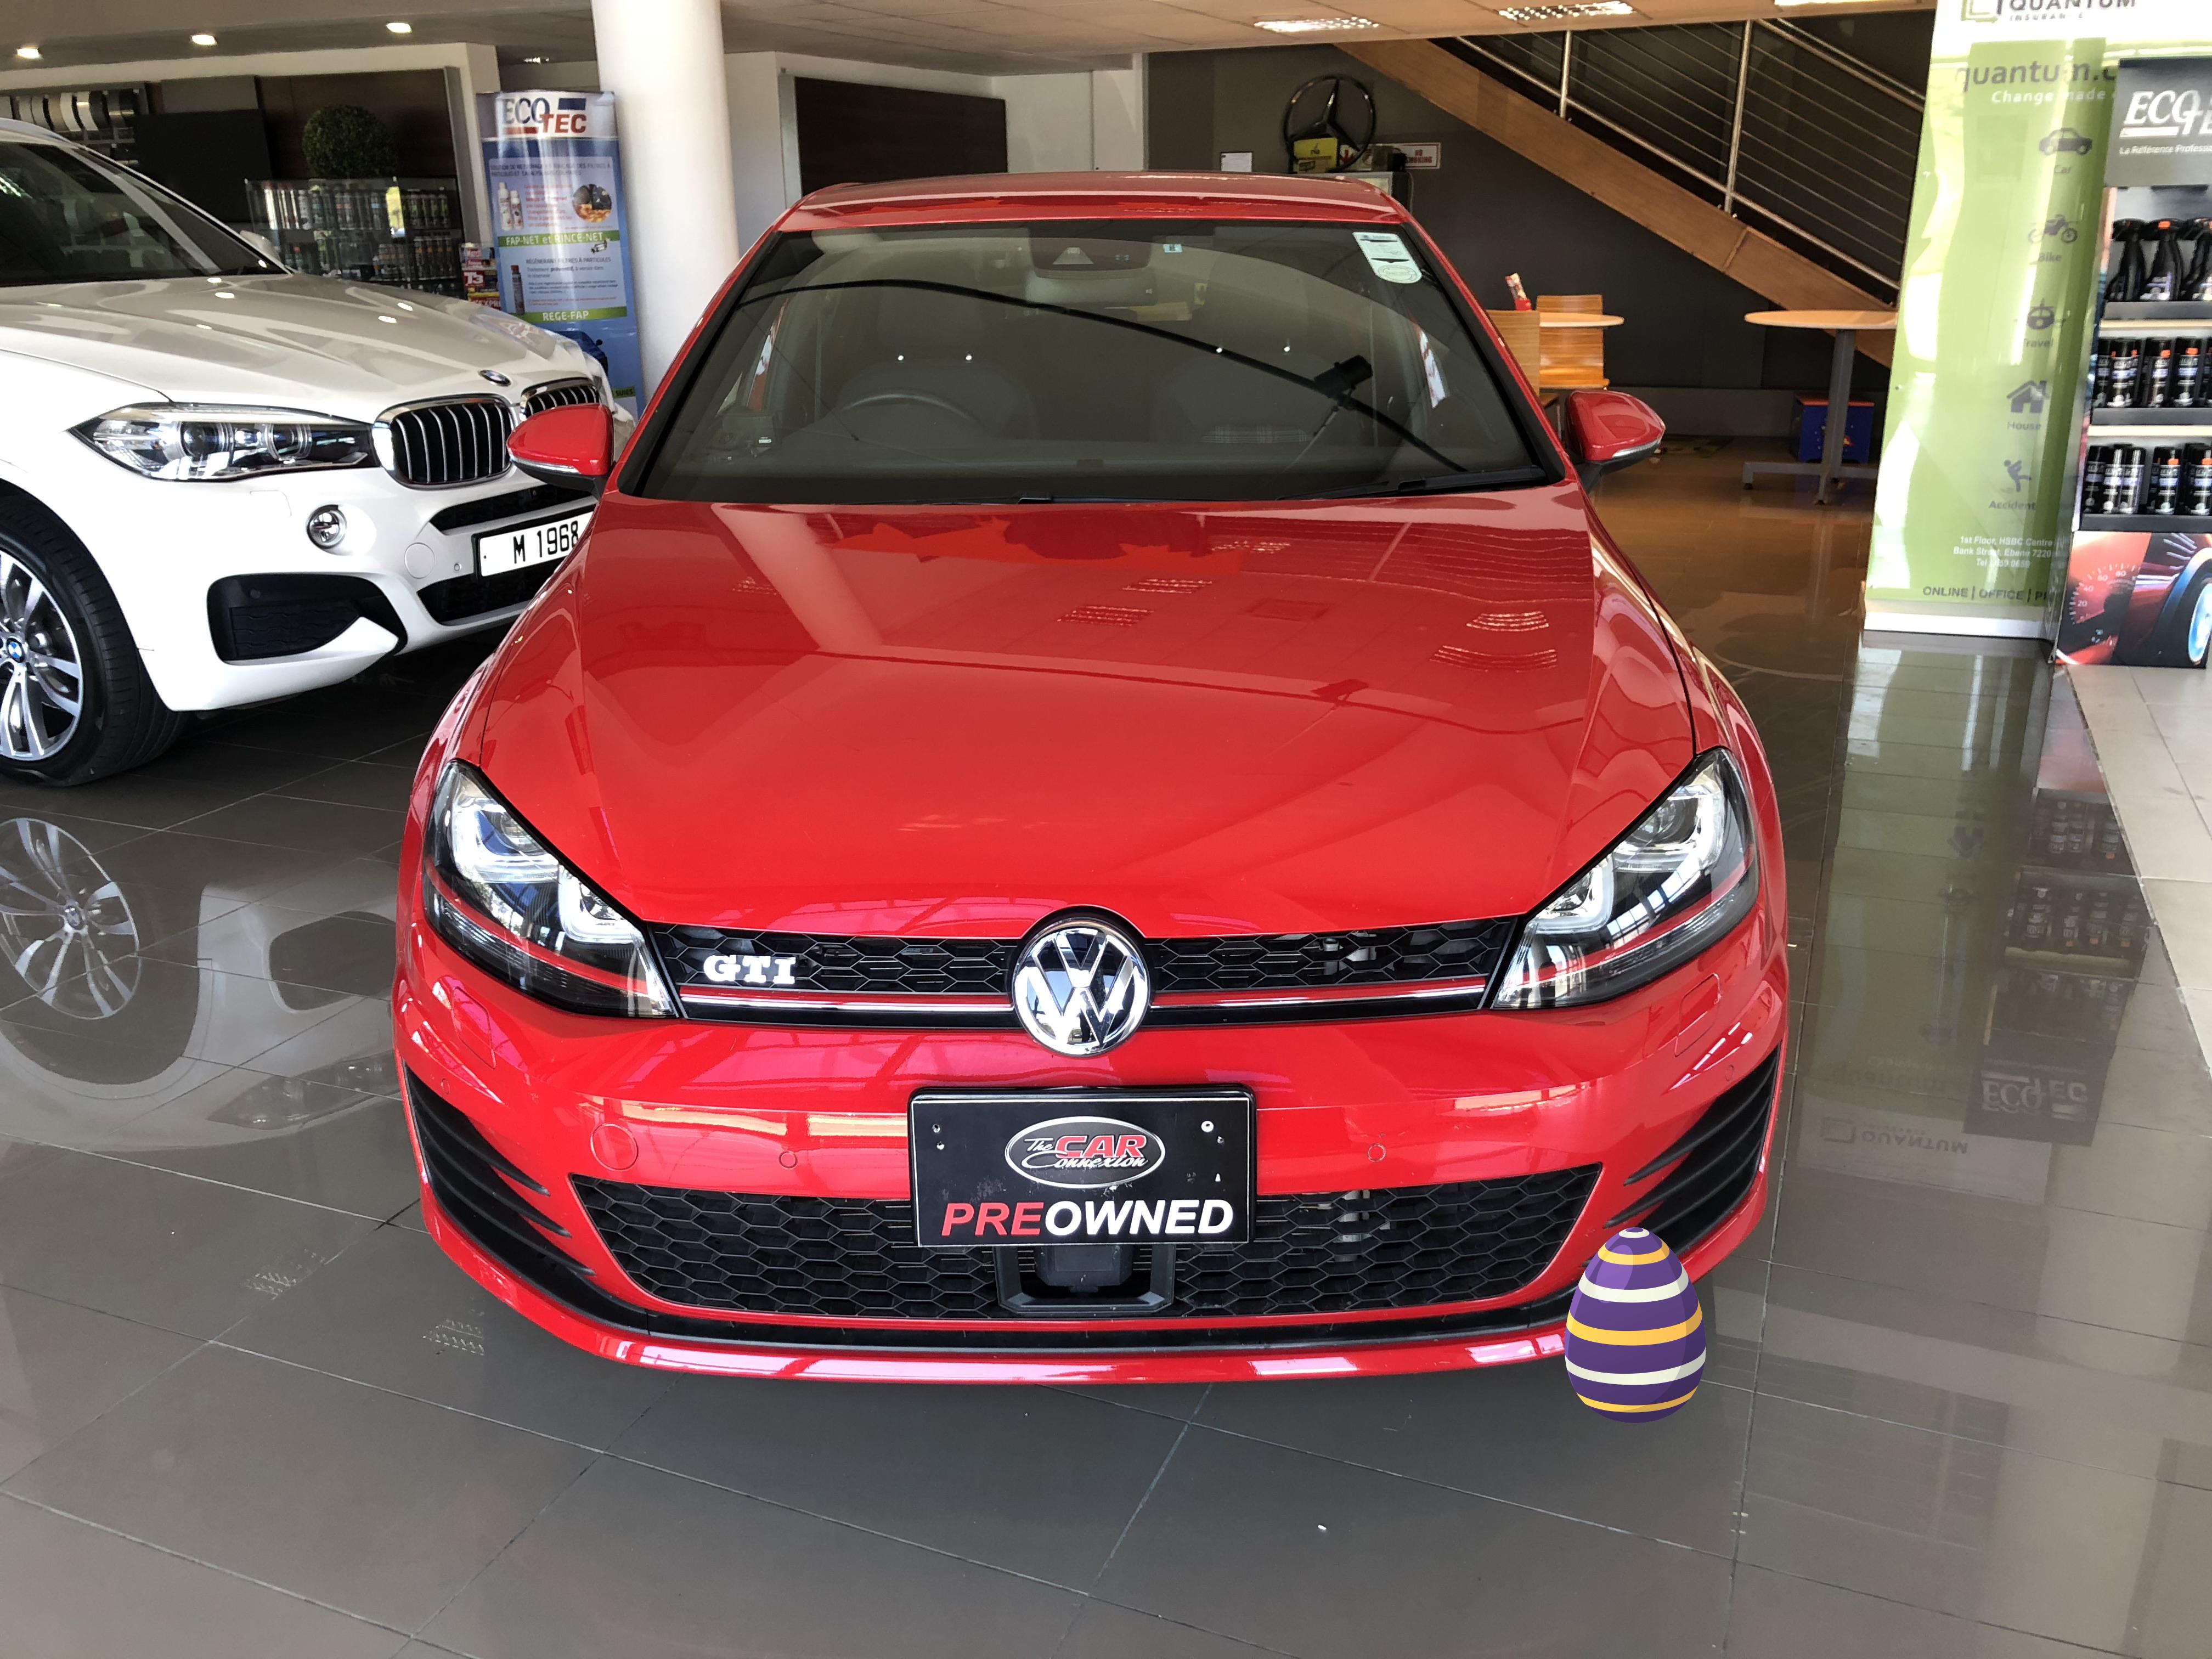 Volkswagen Golf GTI 1